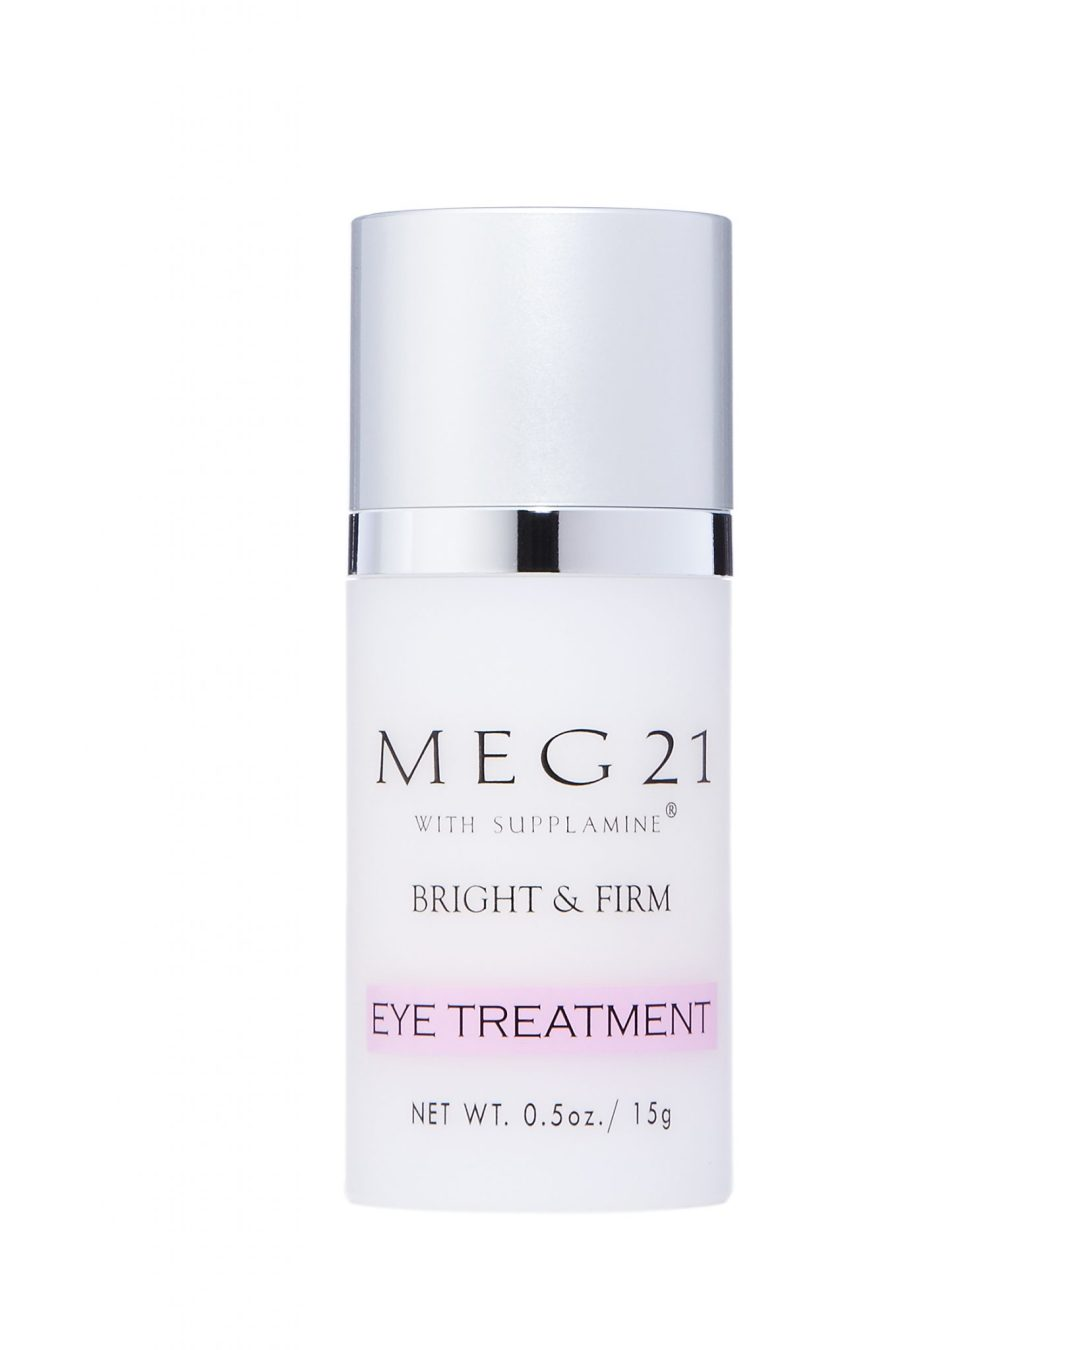 Eye Treatment with Supplamine